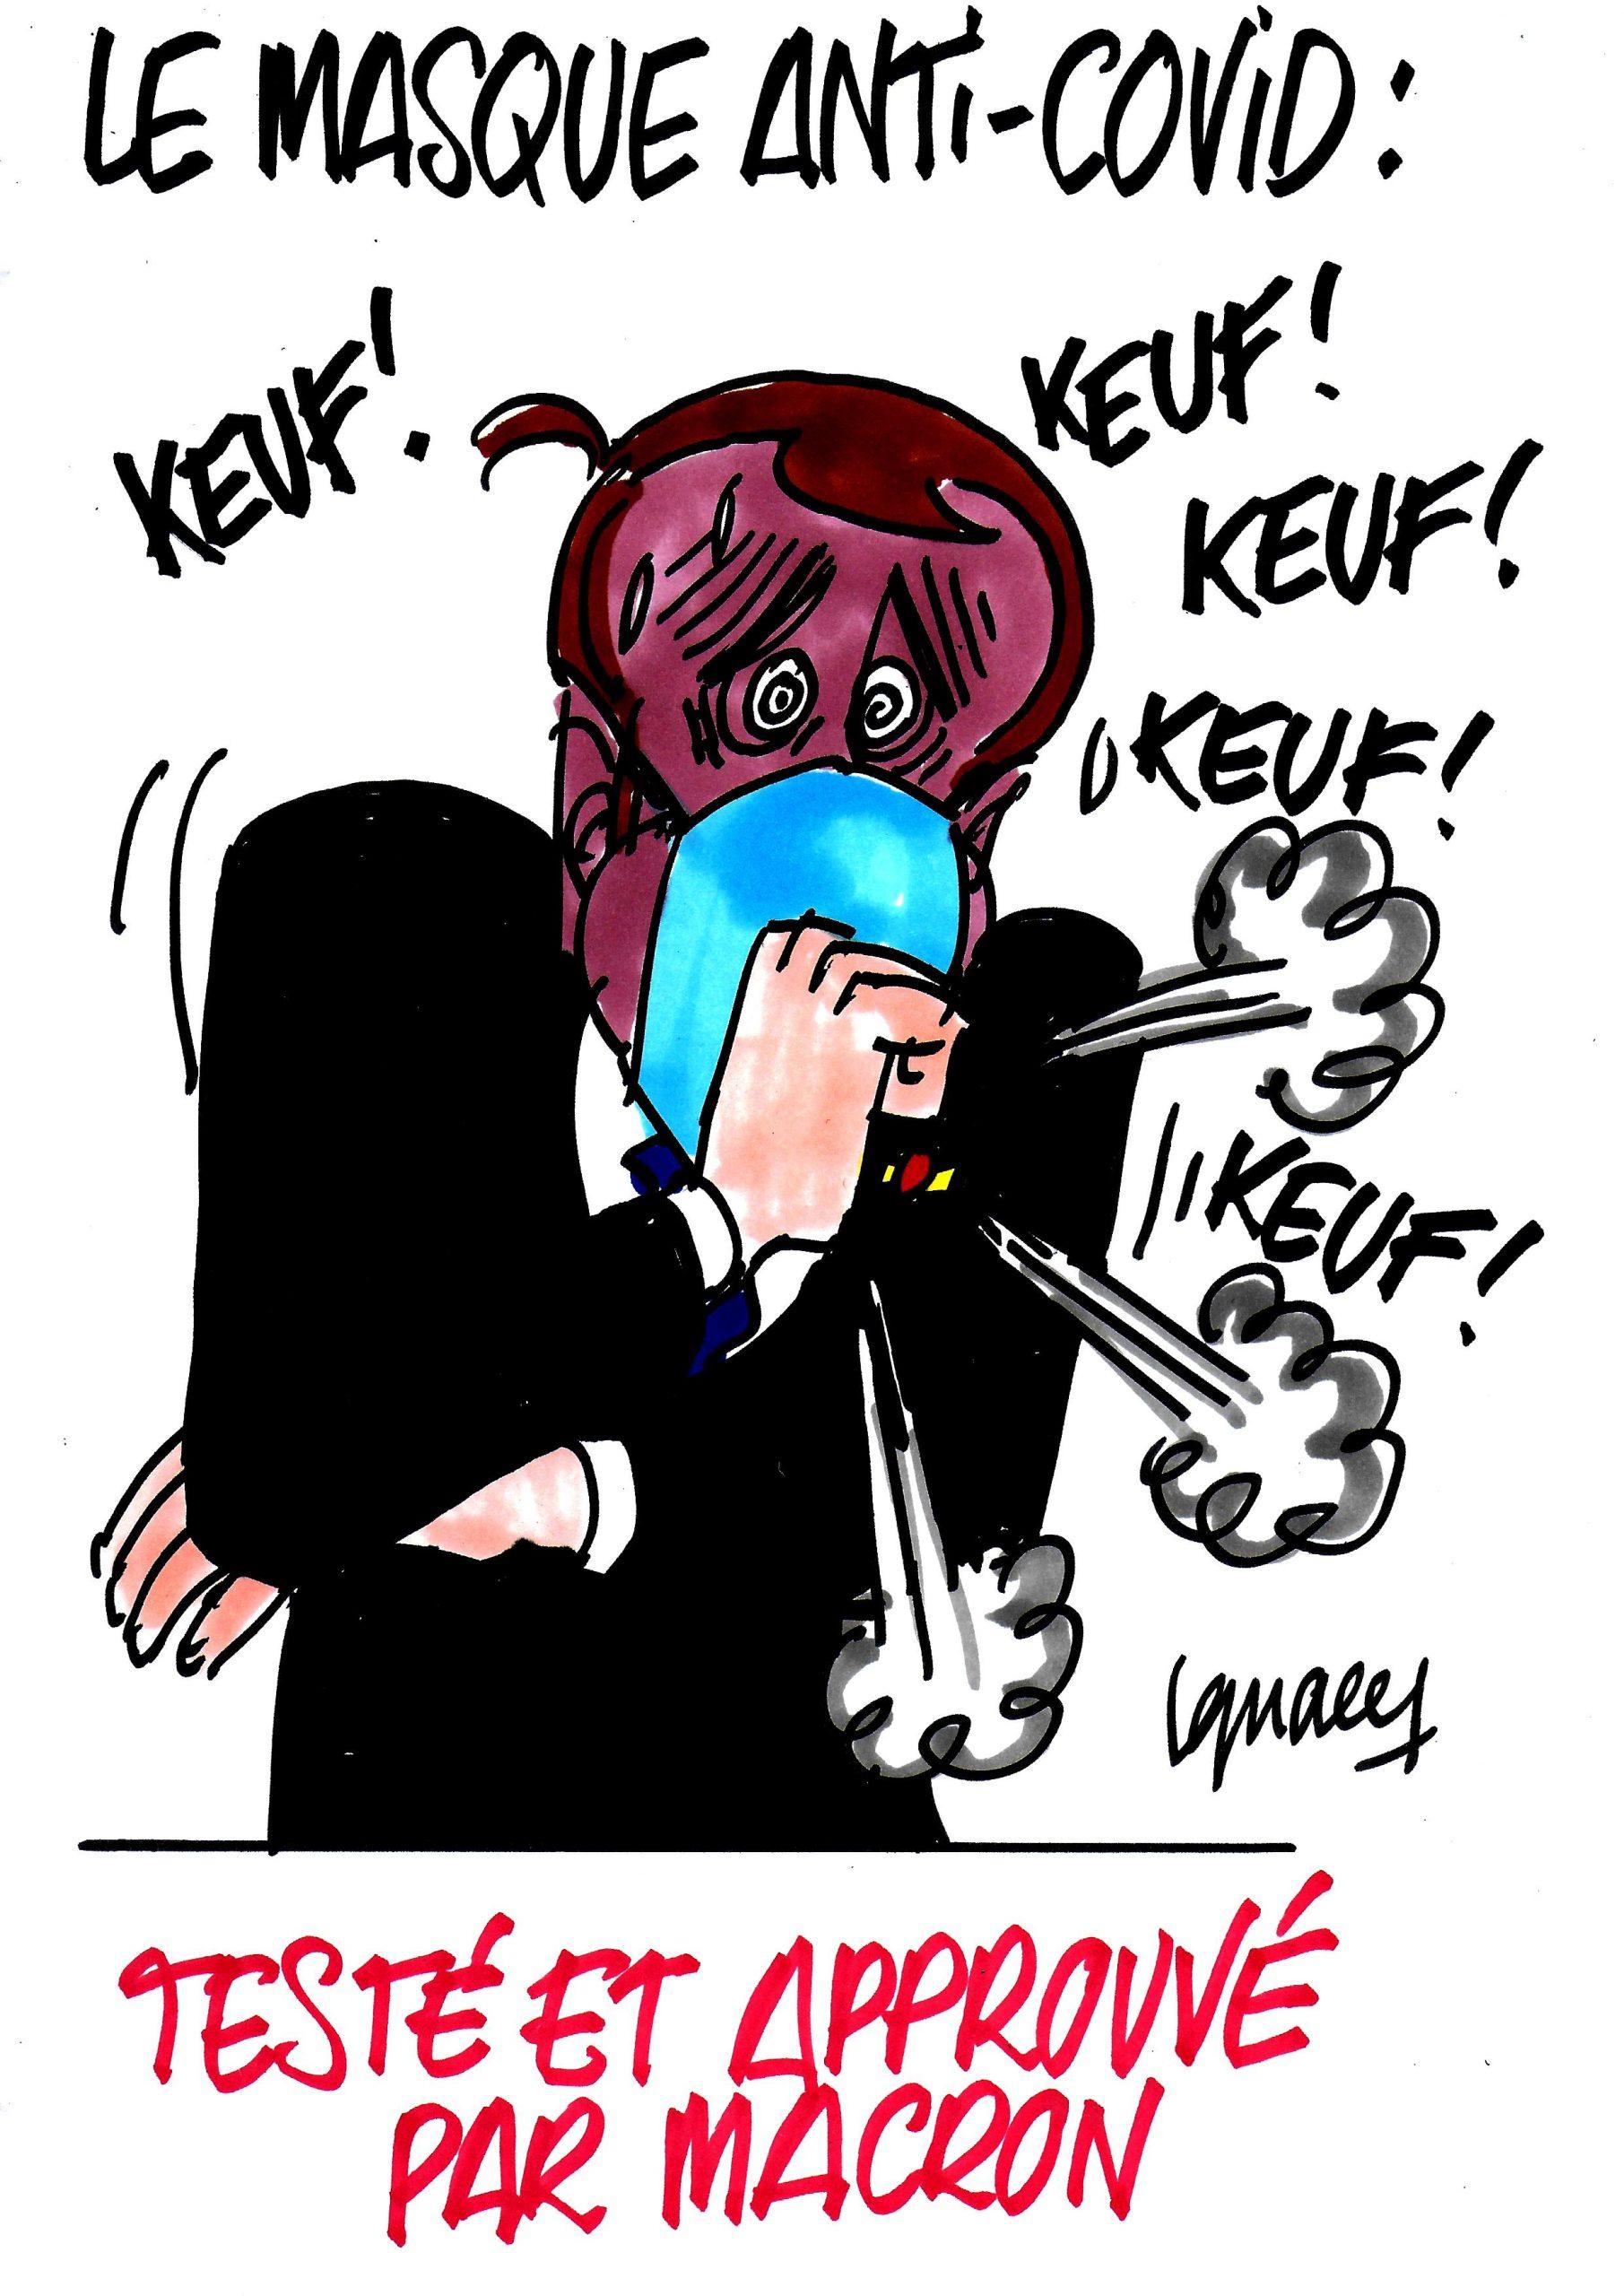 Ignace - Macron et le masque